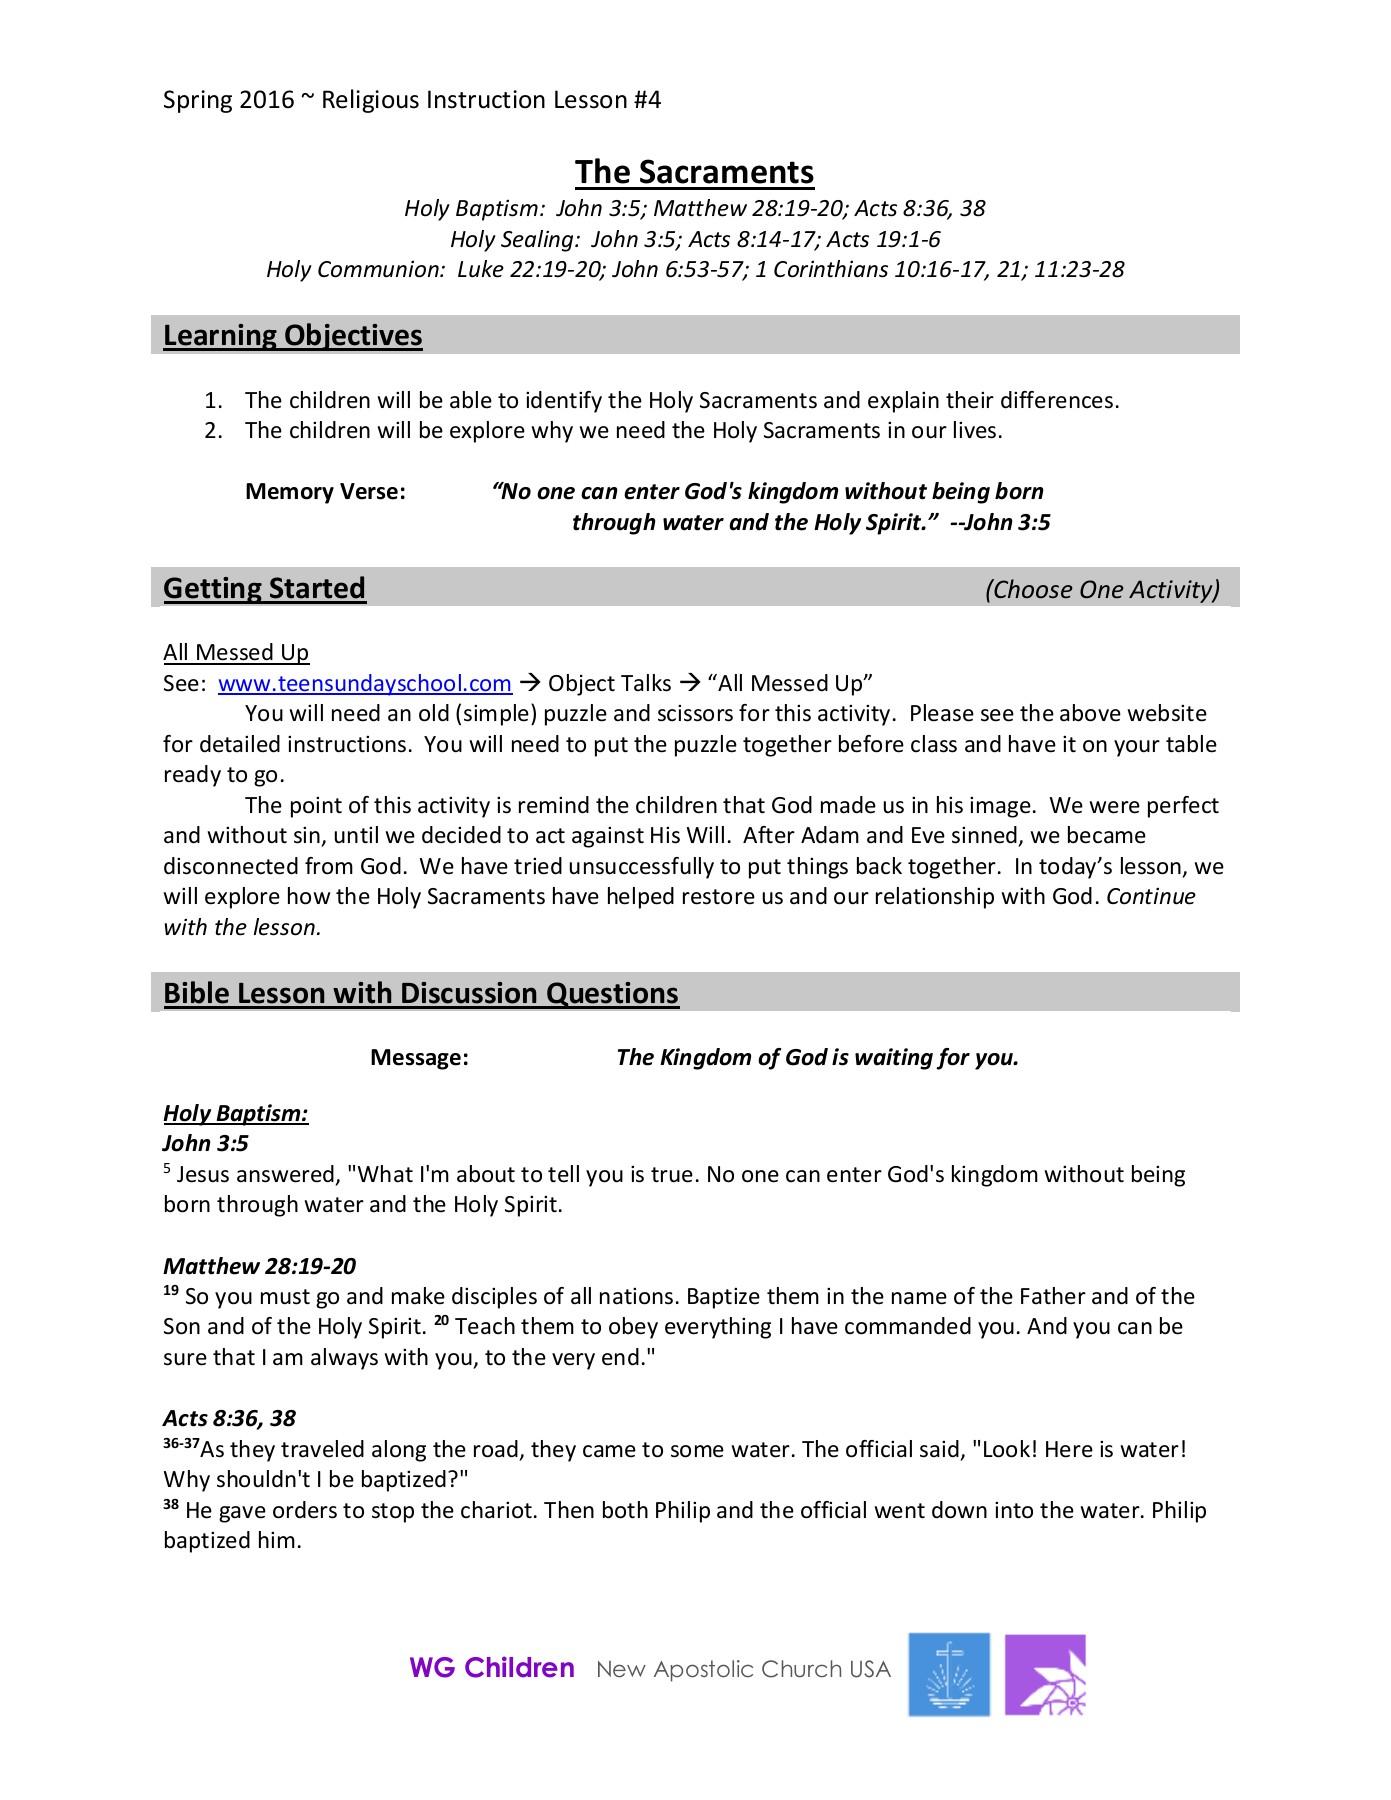 hight resolution of The Sacraments - nac-usa.org-Flip eBook Pages 1 - 5  AnyFlip   AnyFlip